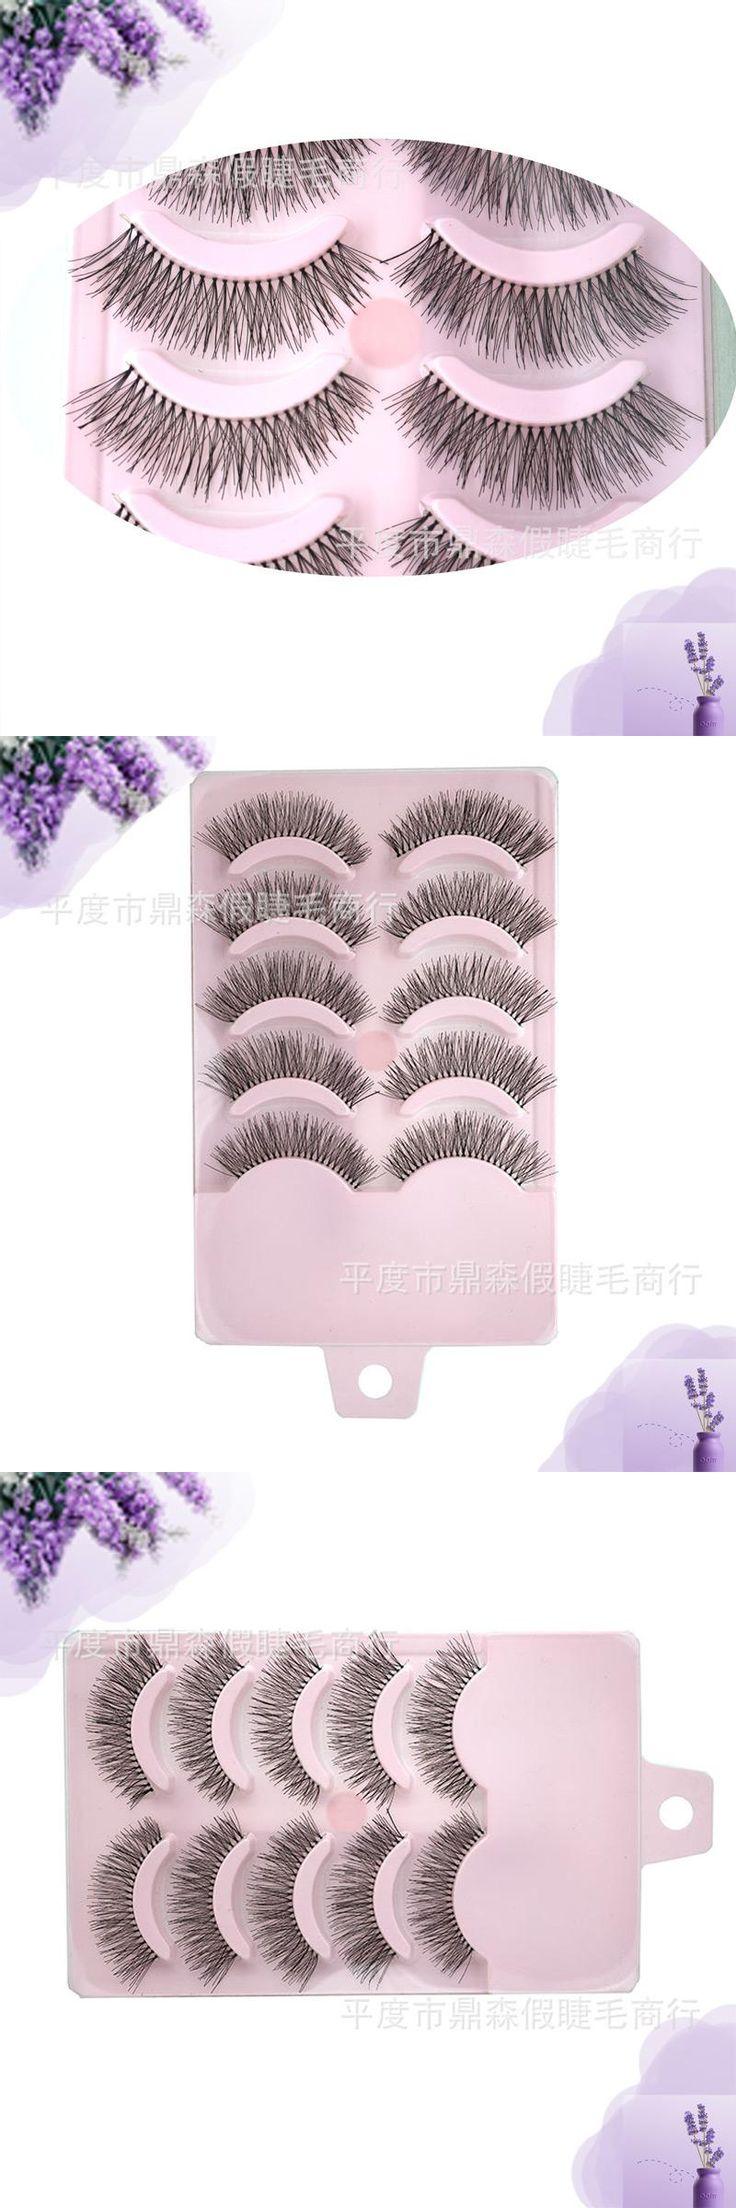 [Visit to Buy] Artificial Popular 5 pairs false eyelashes make up natural long valse wimpers strips eyelash fake eye lashes cosmetics #Advertisement